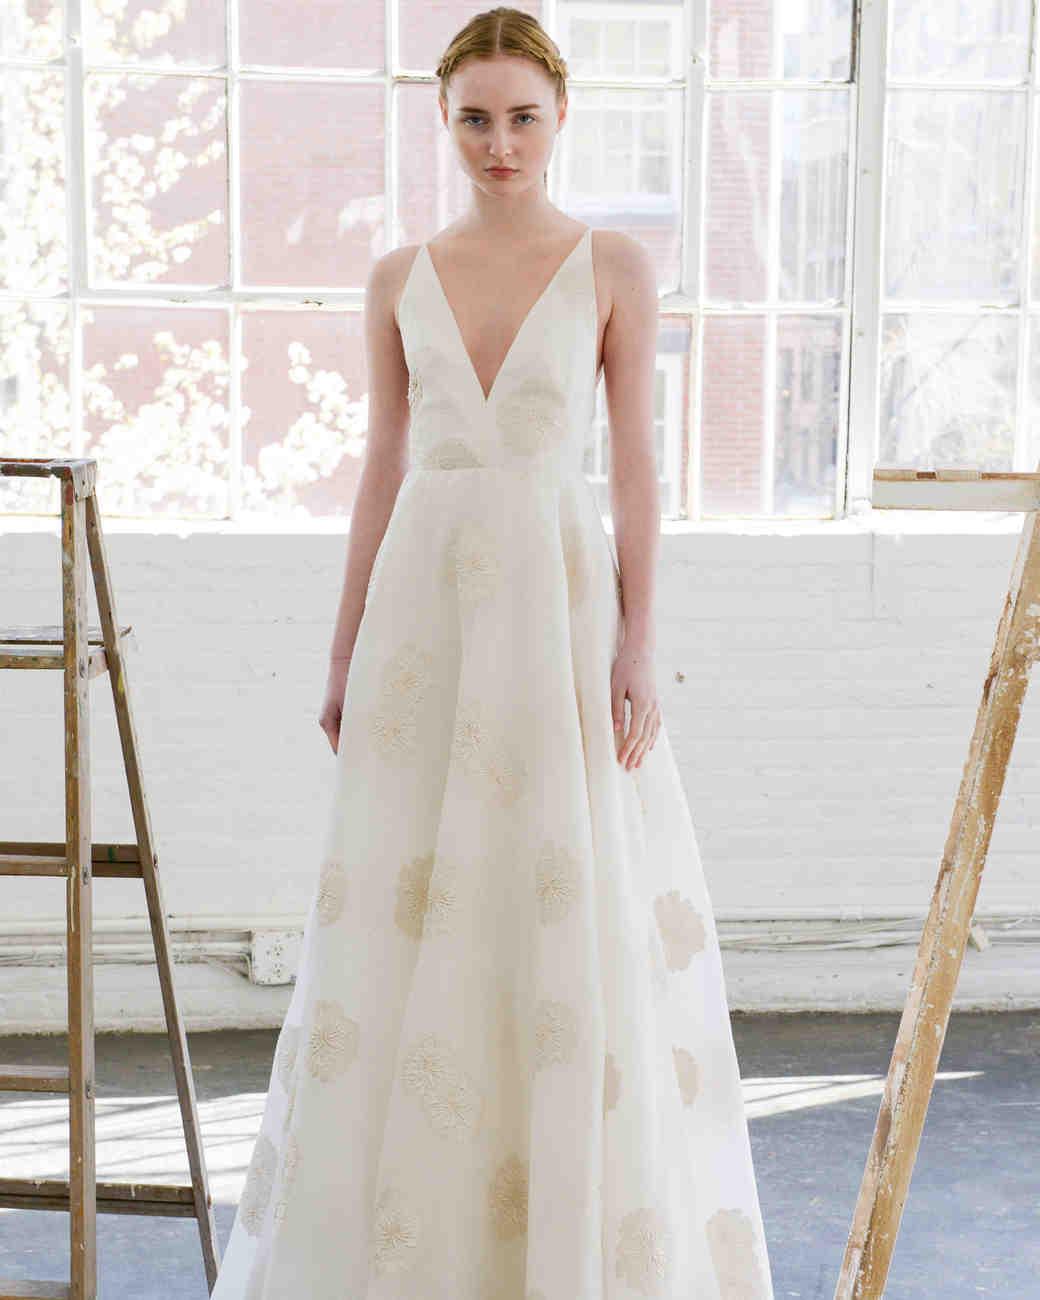 b9e4cf9aa0 Lela Rose Spring 2017 Wedding Dress Collection